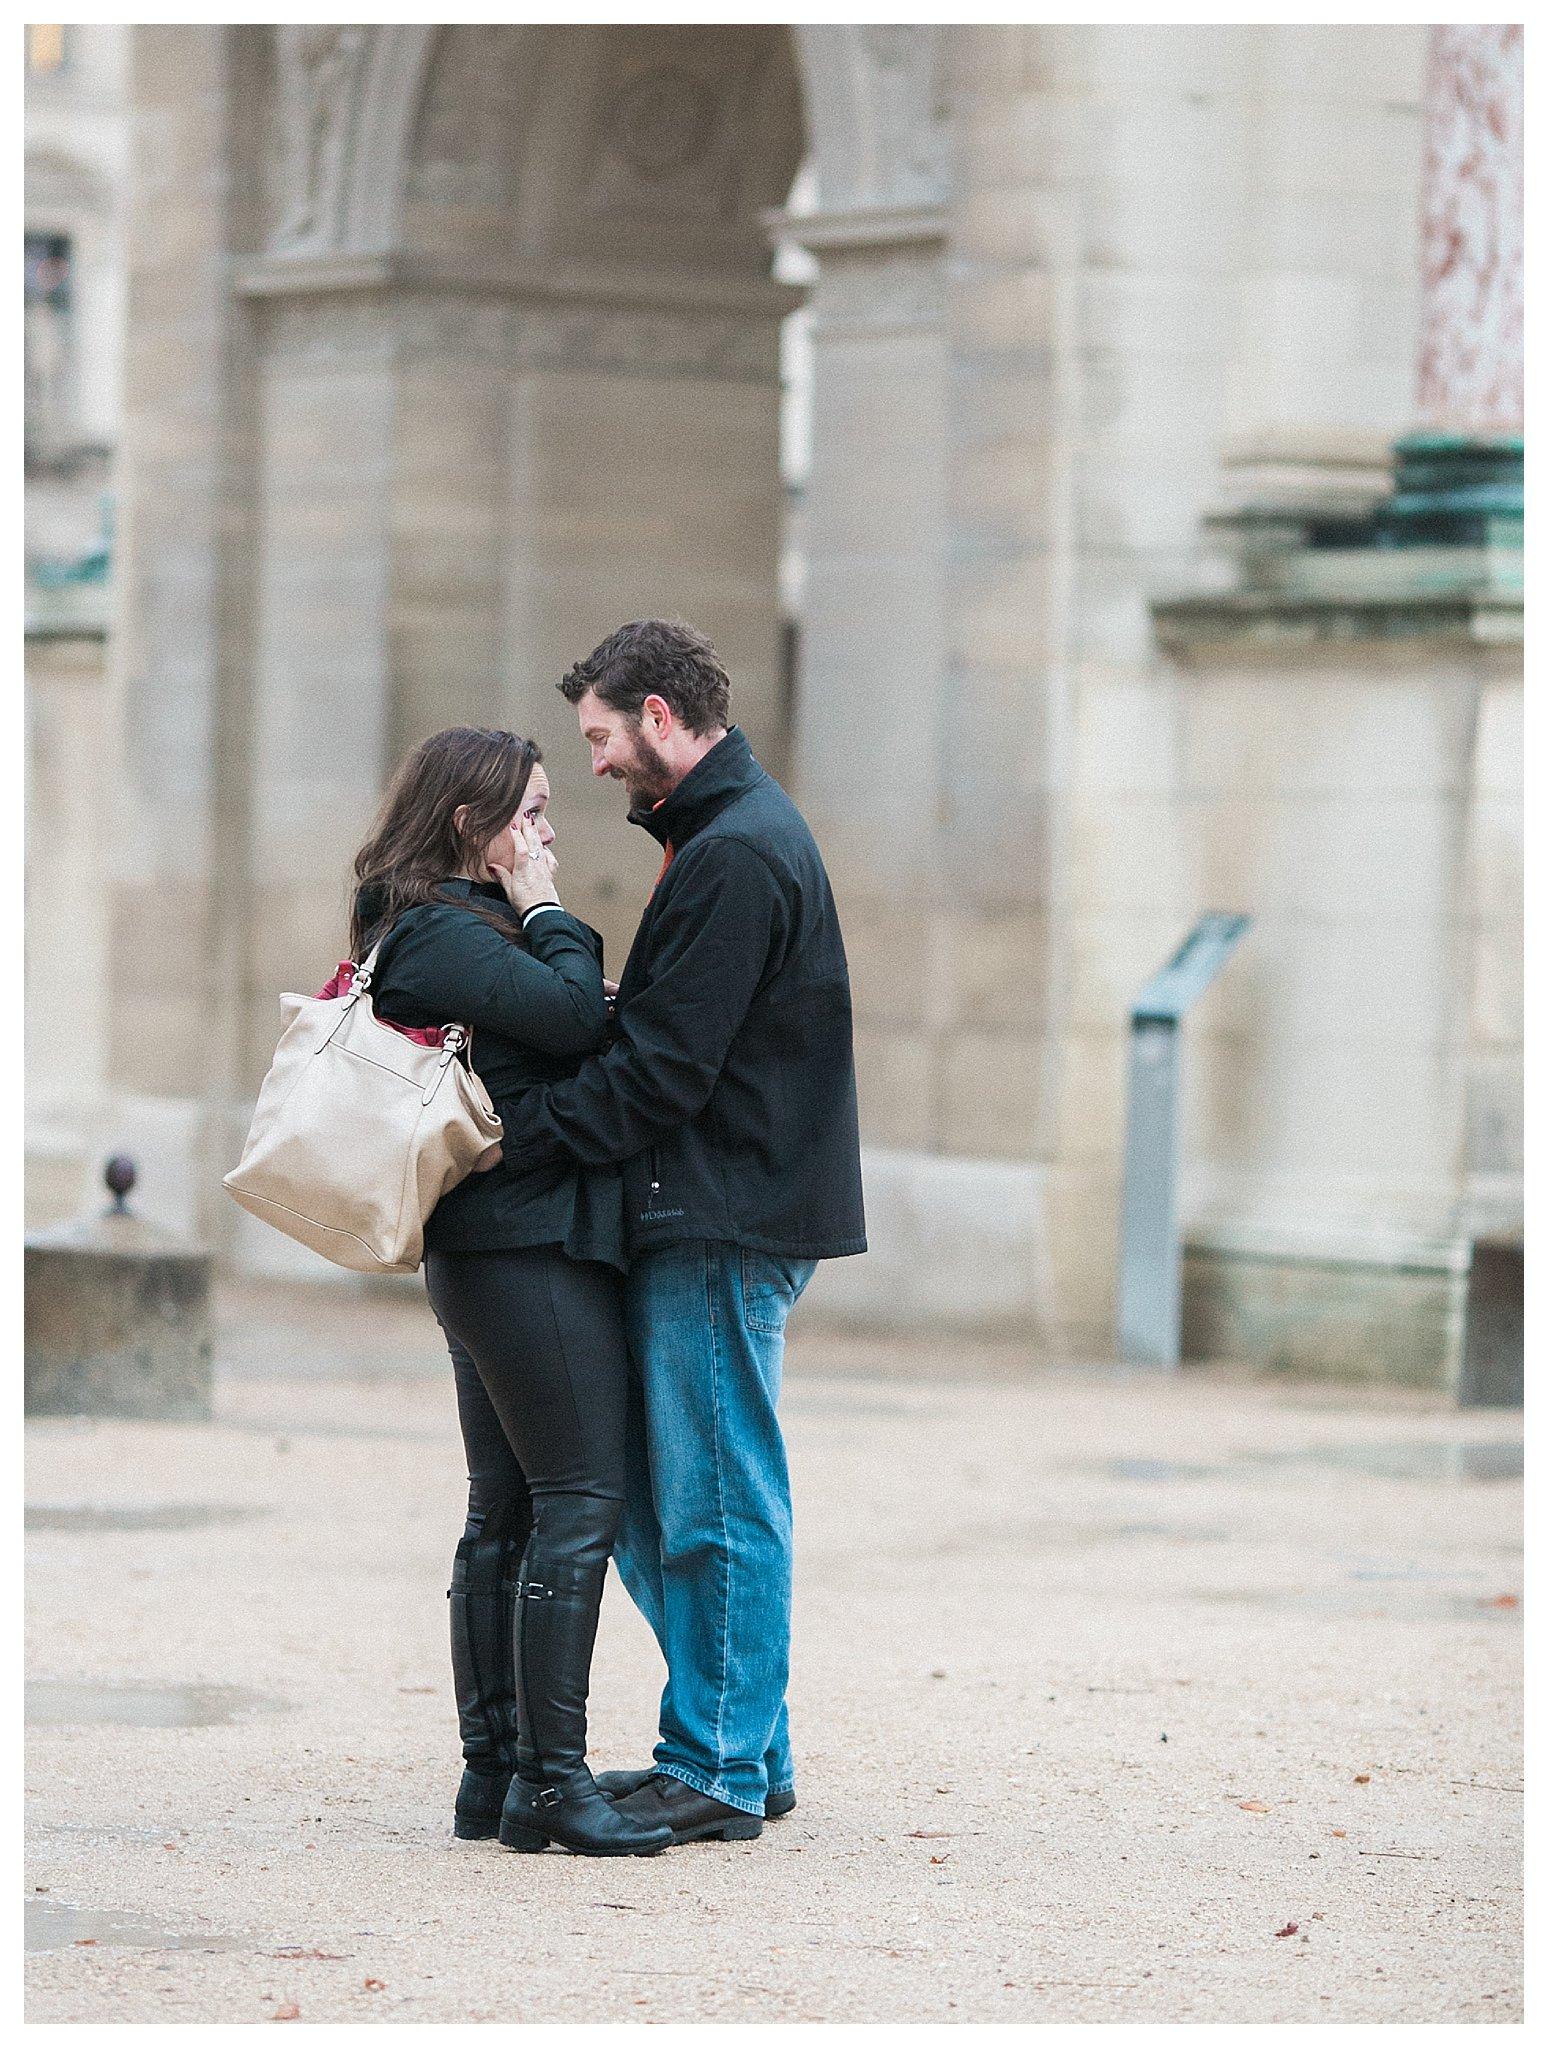 Our Engagement in Paris | Paris, France | Andrea Rodway Photography